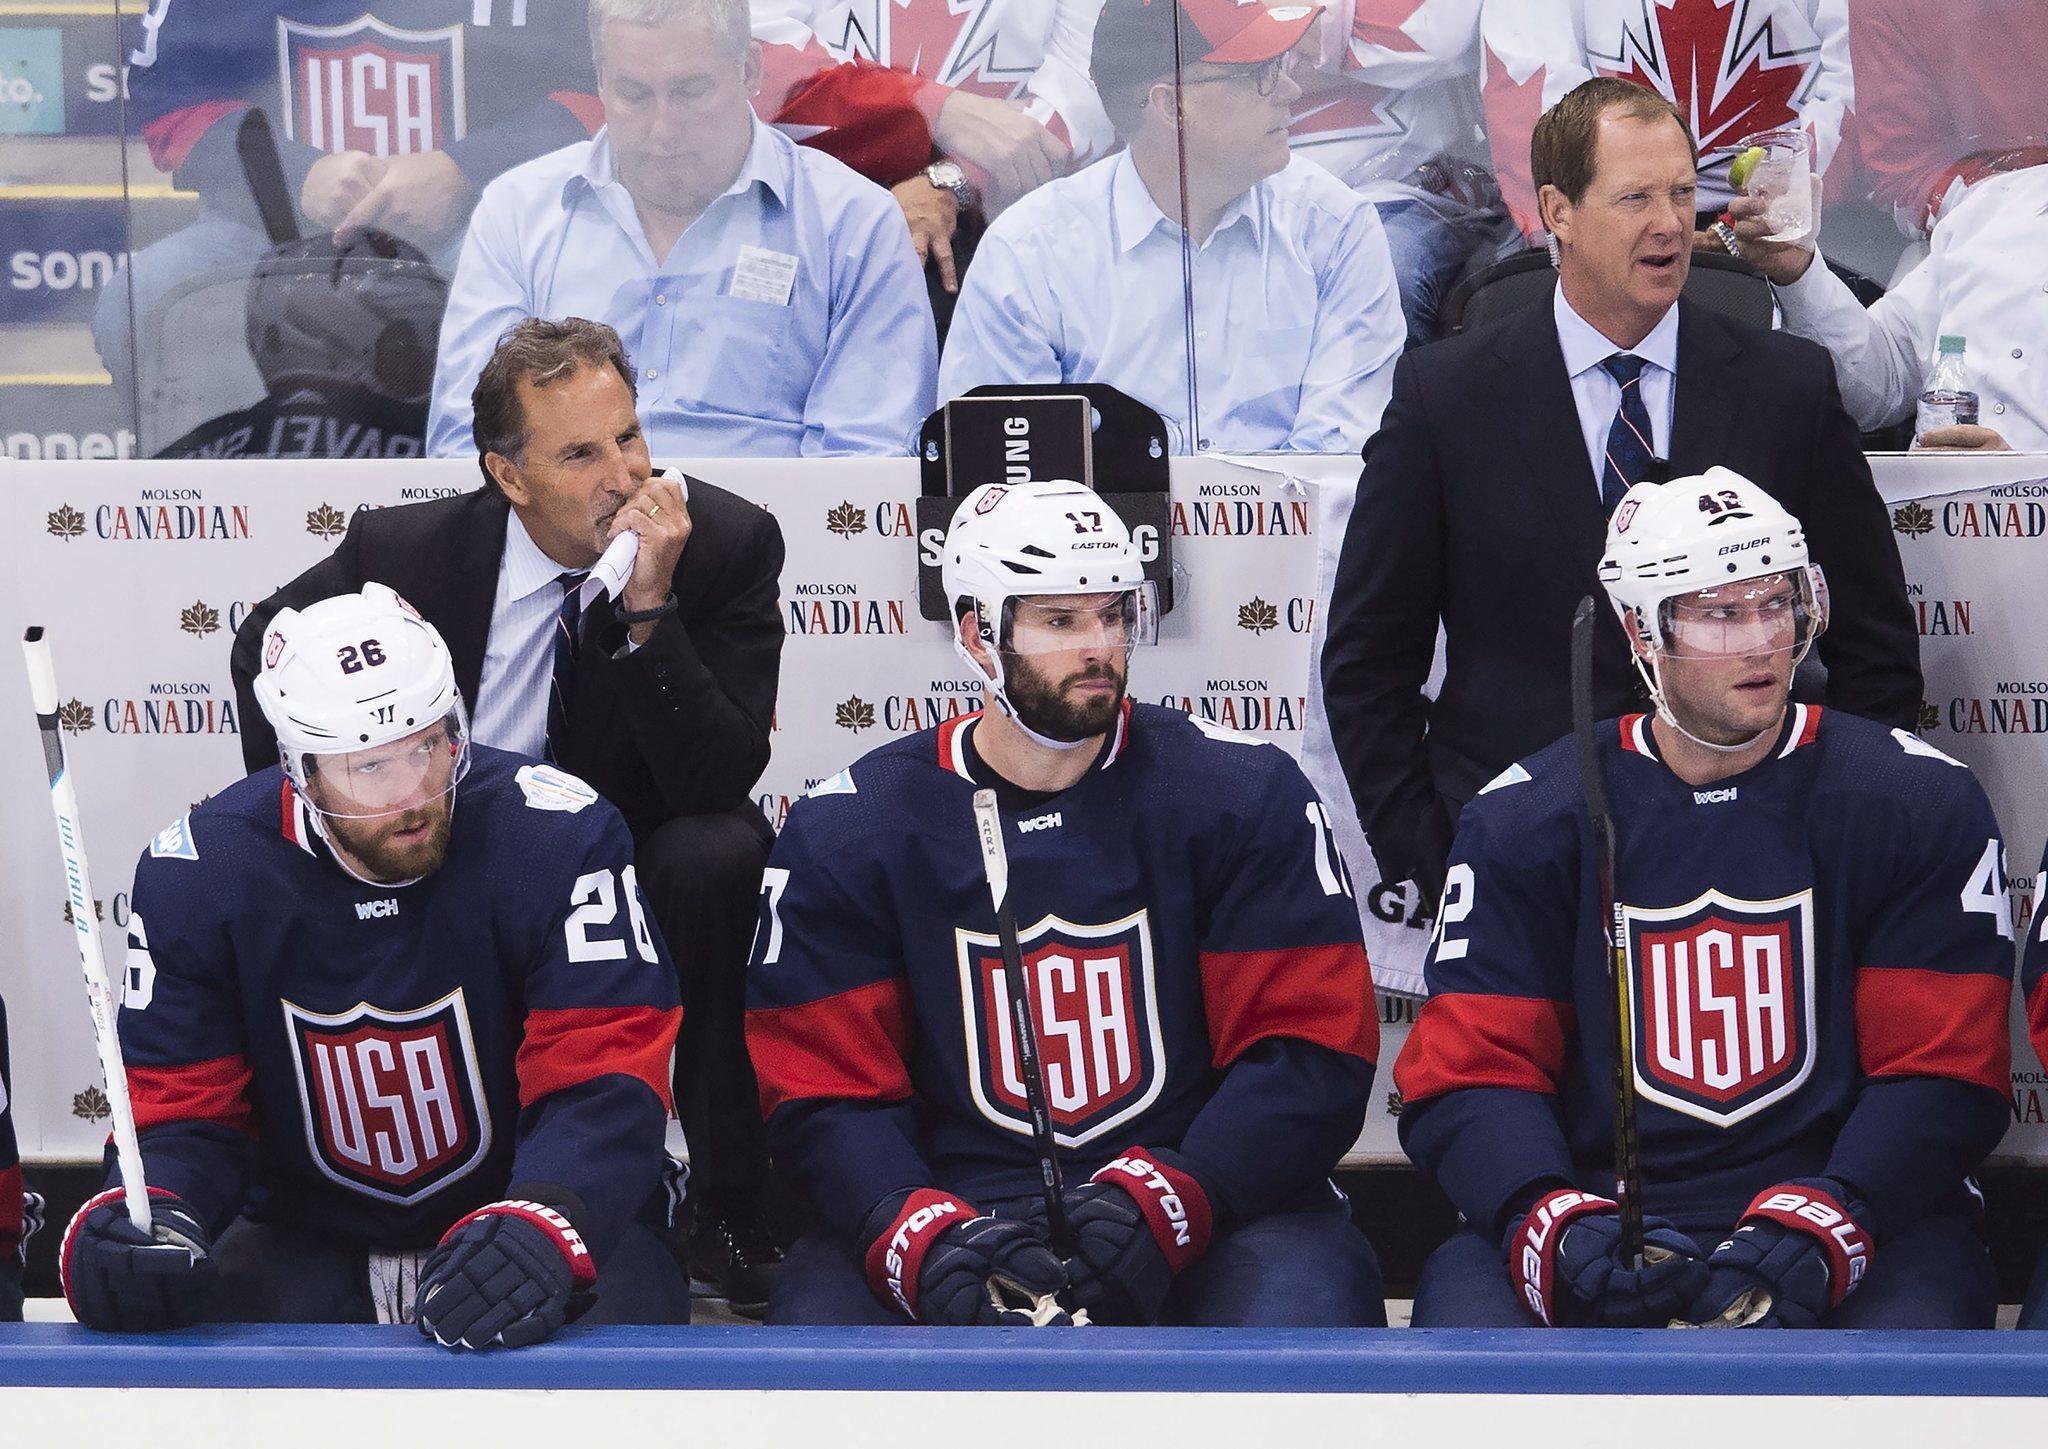 Ct-usa-failure-world-cup-hockey-spt-0922-20160921